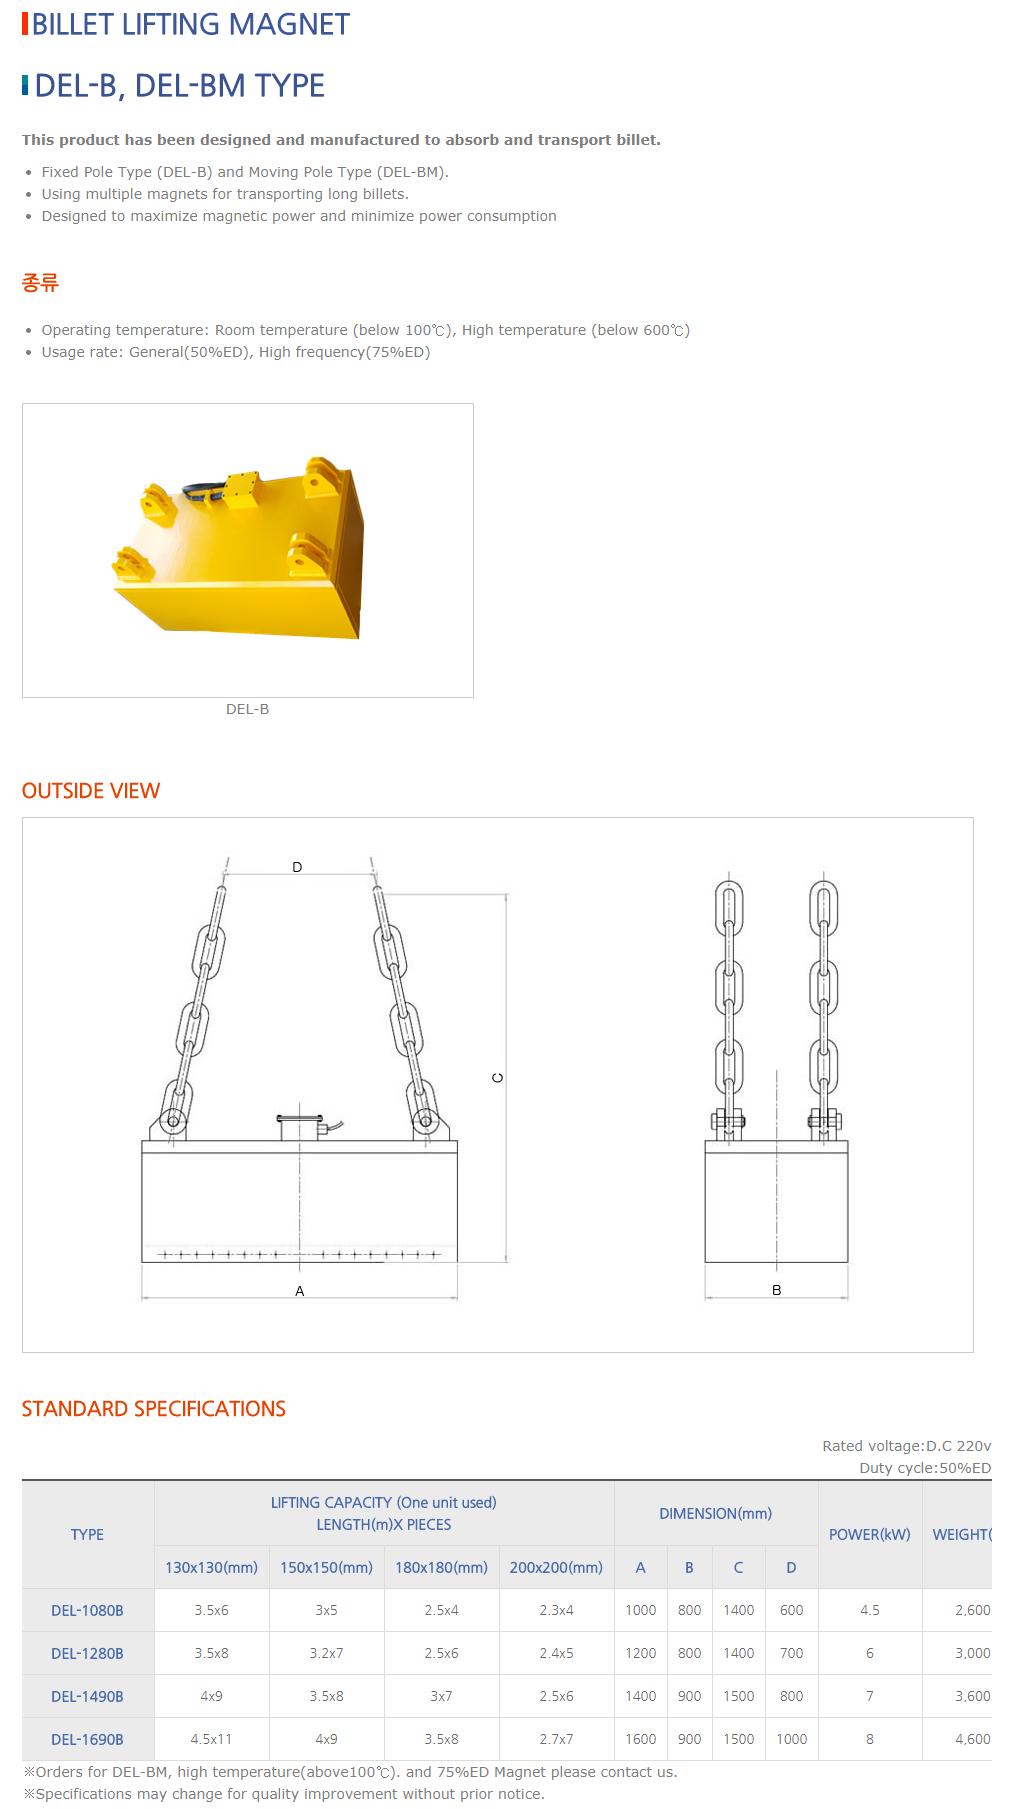 DAESUNG MARGNET Billet Lifting Magnet DEL-B/DEL-BM Type